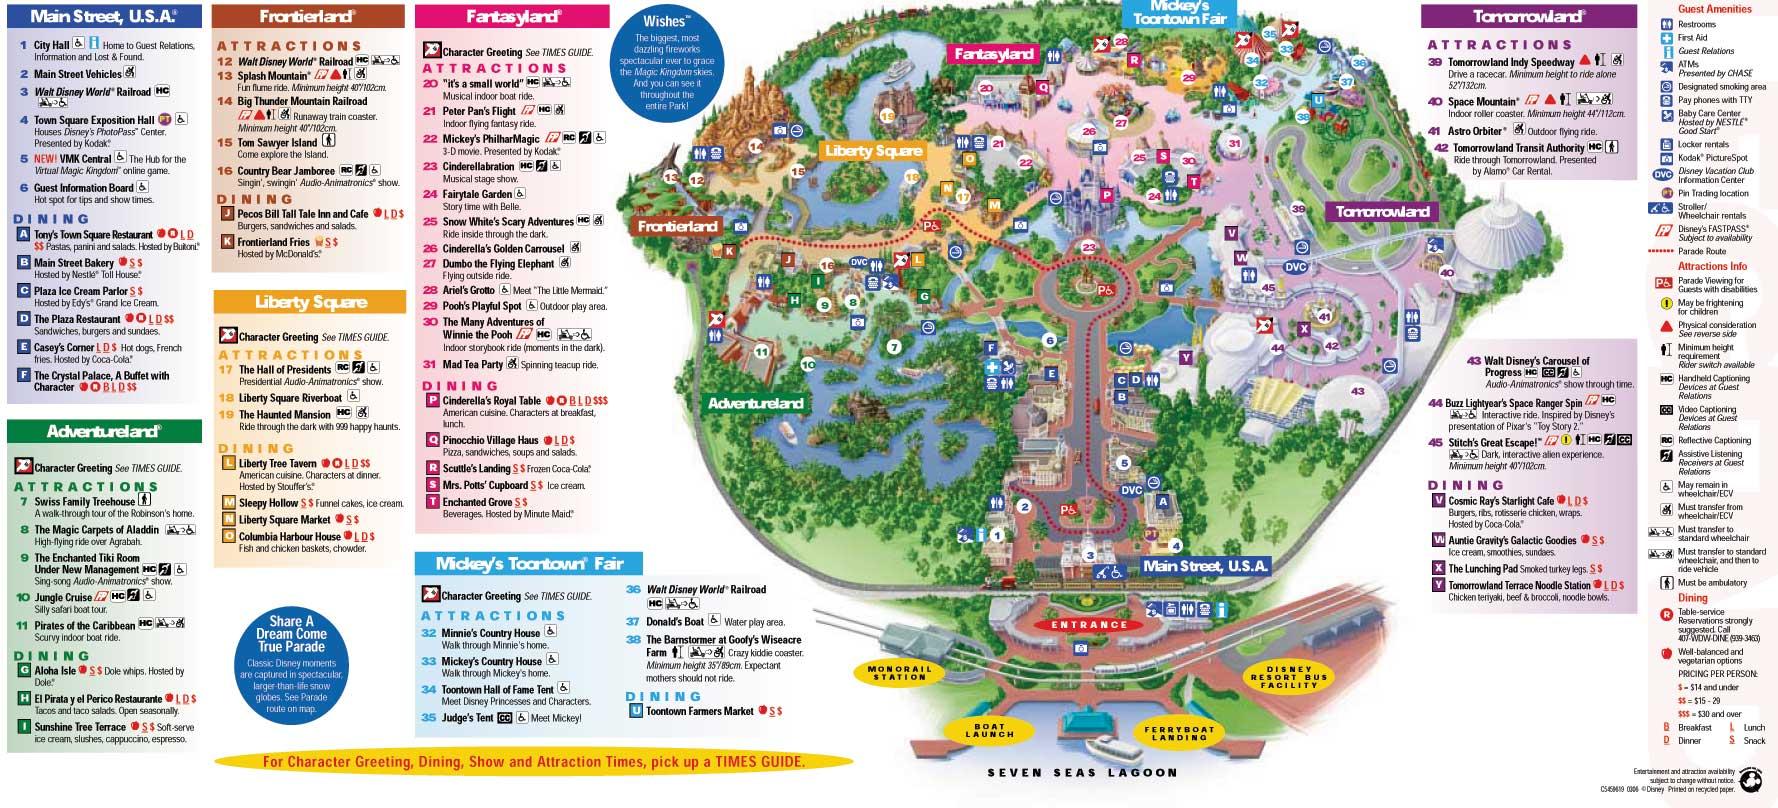 Disney World Map 2016 Pdf.Disney Magic Maps Of Walt Disney World